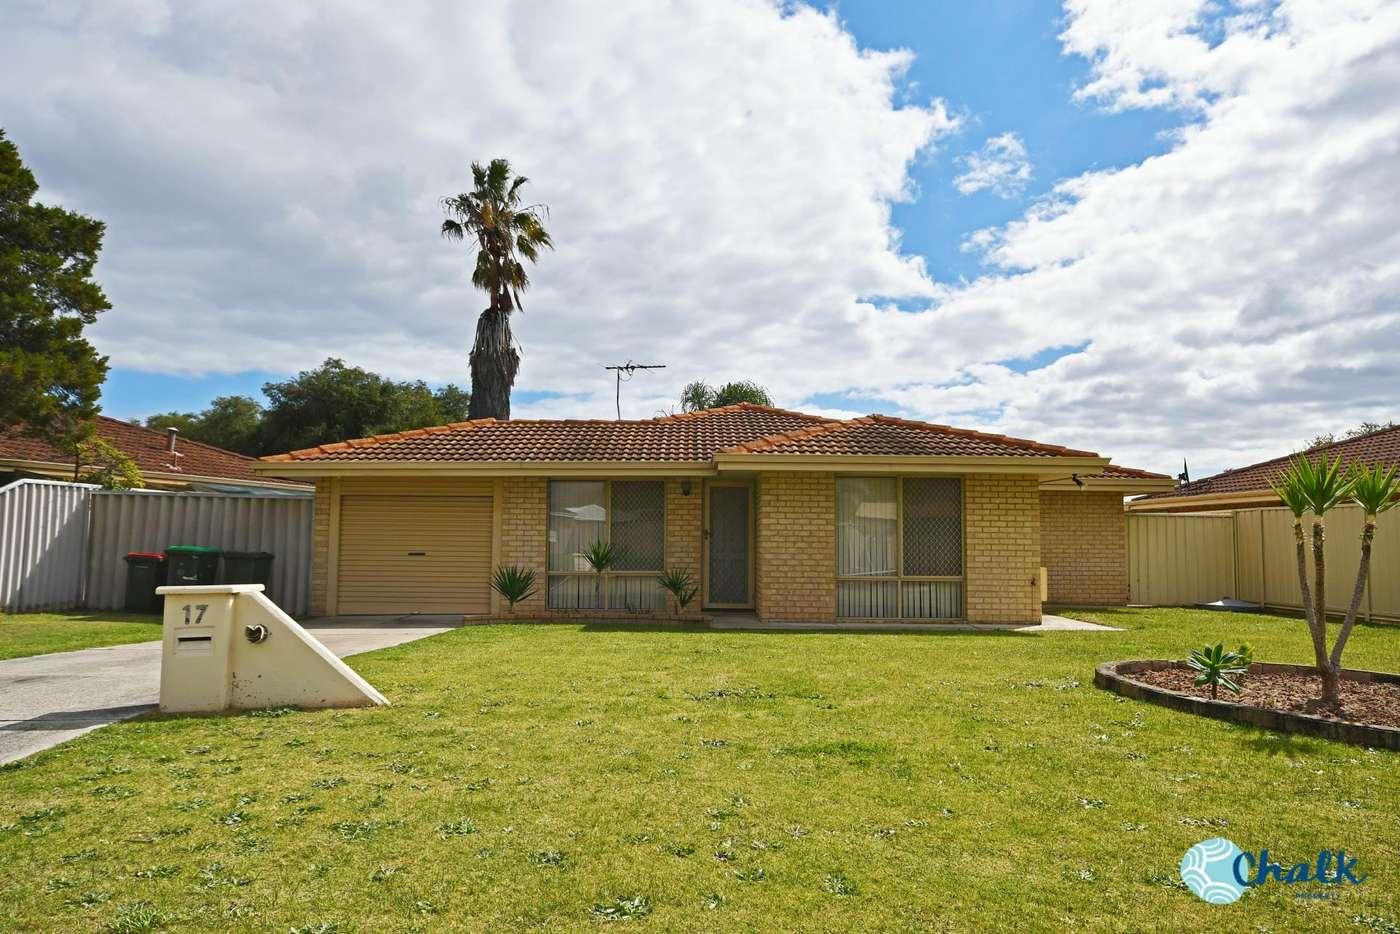 Main view of Homely house listing, 17 Barlee Crescent, Waikiki WA 6169